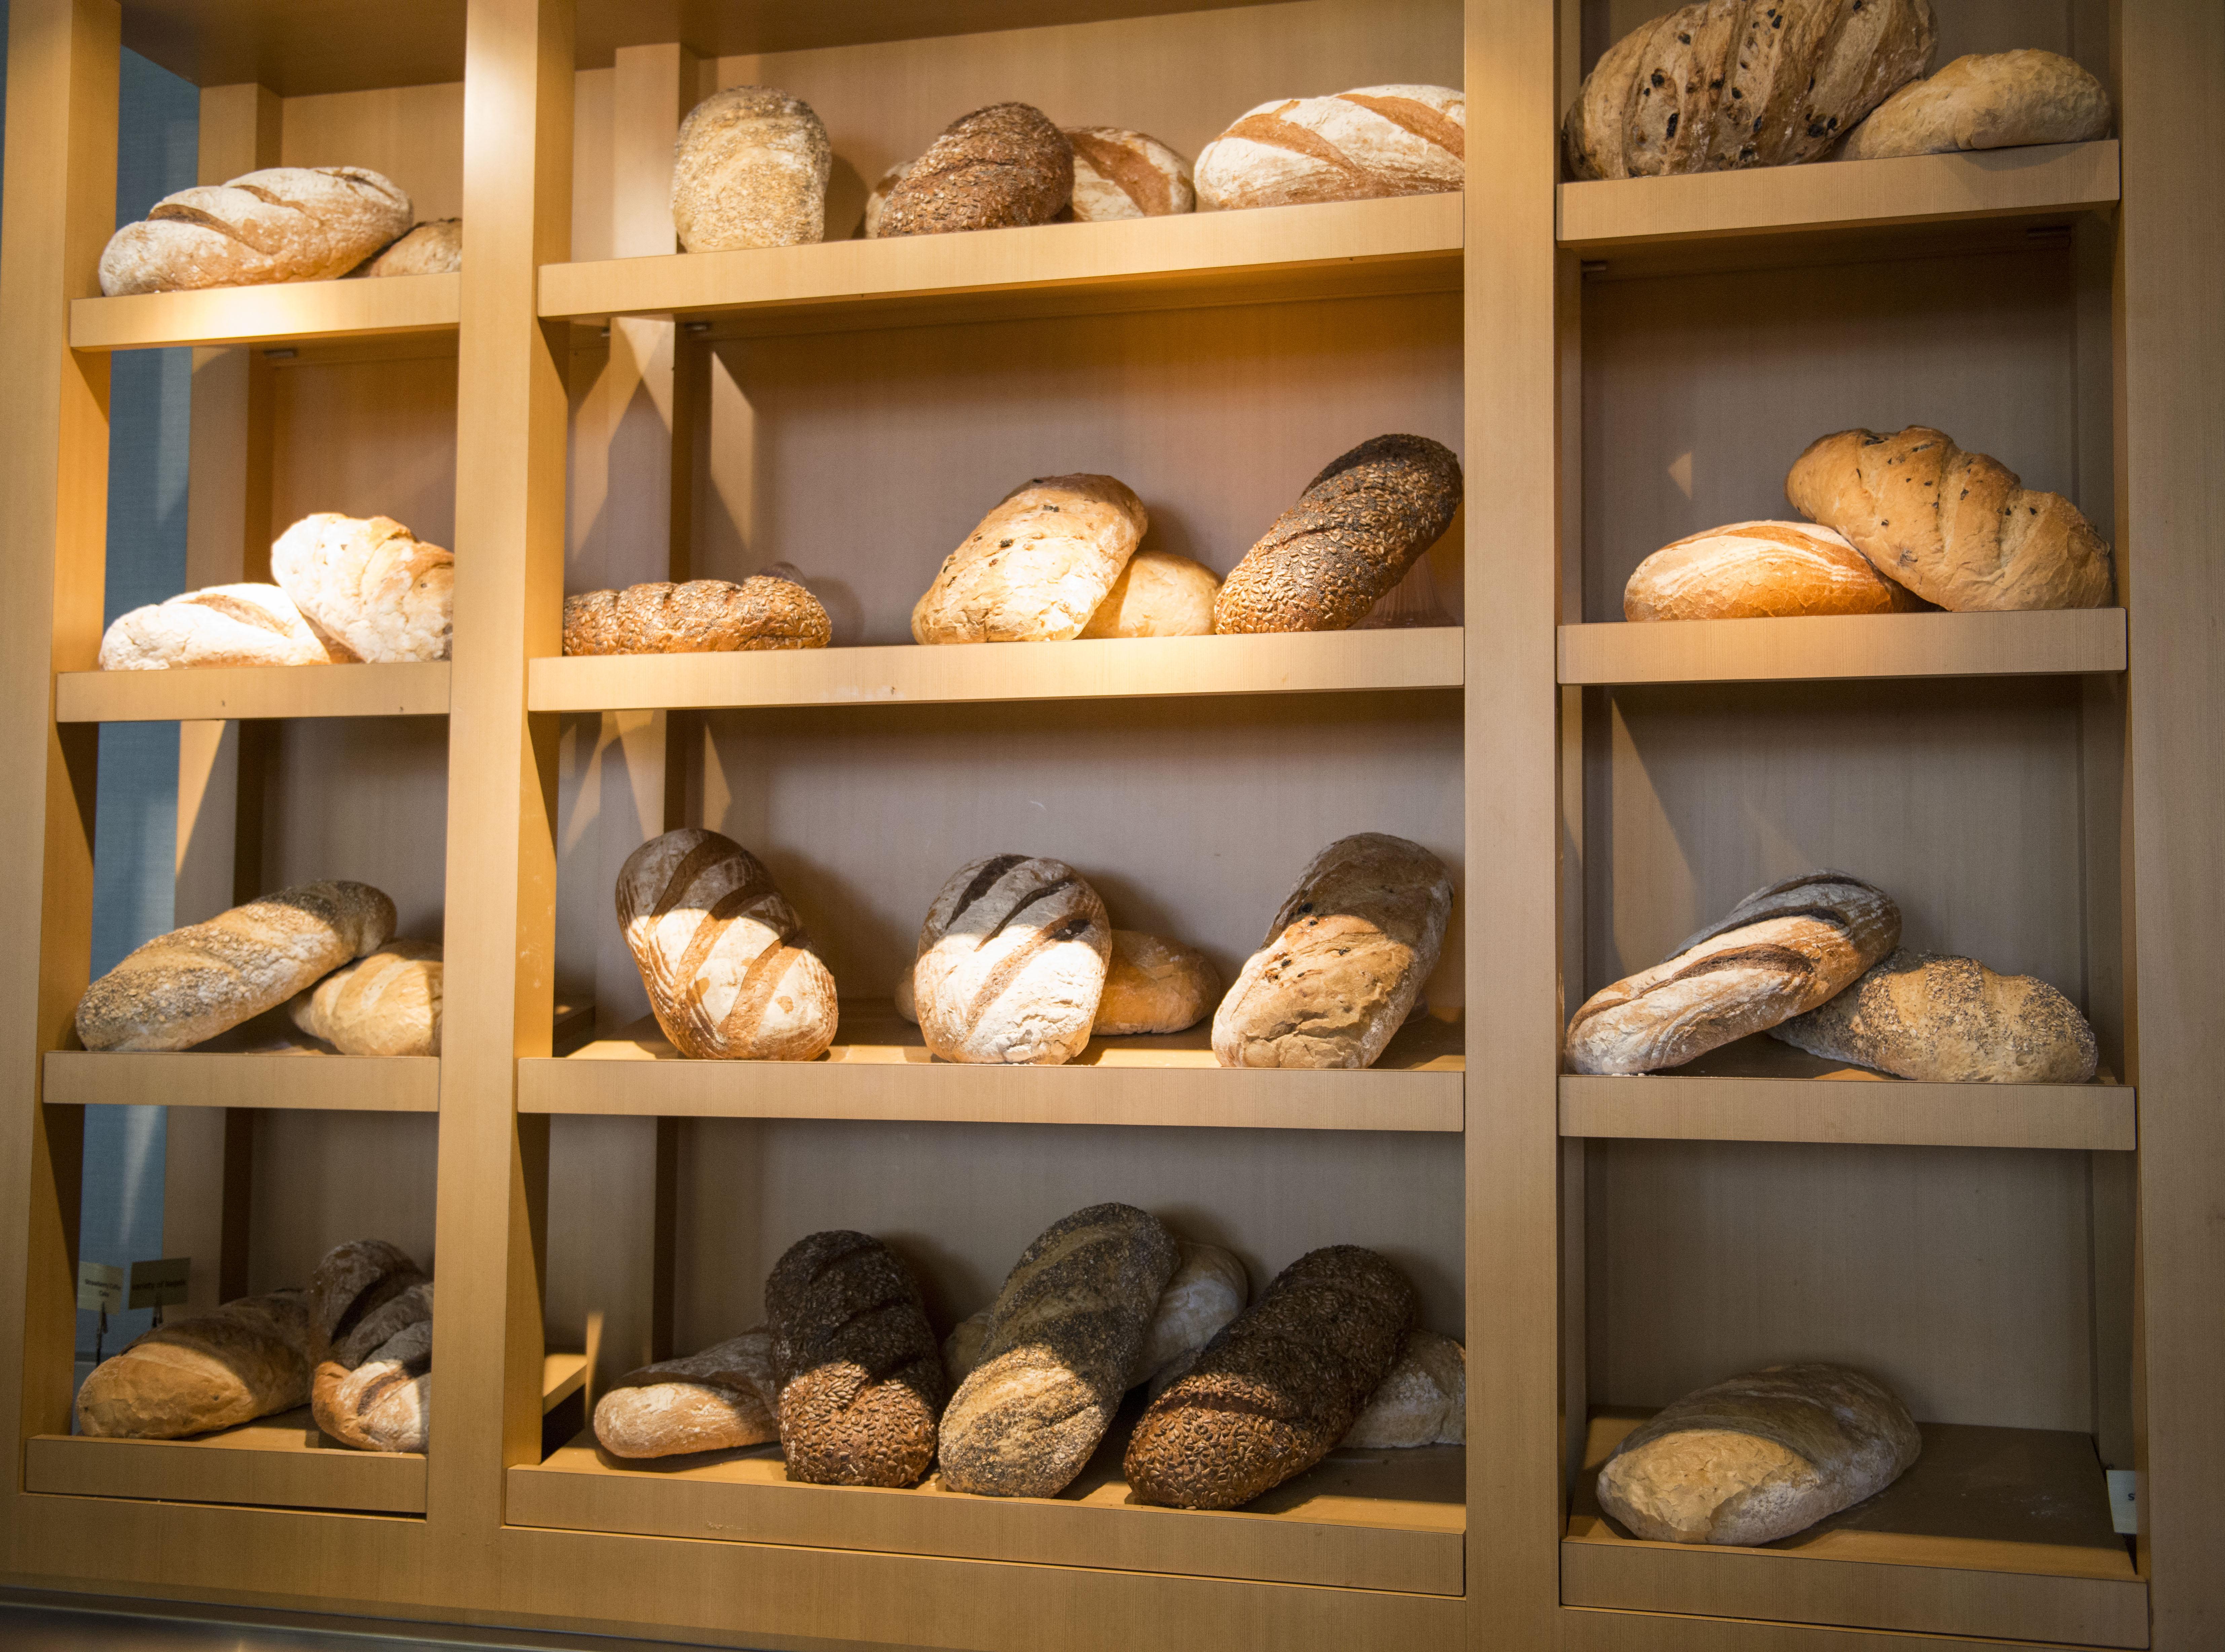 Food myths: vindicating carbohydrates